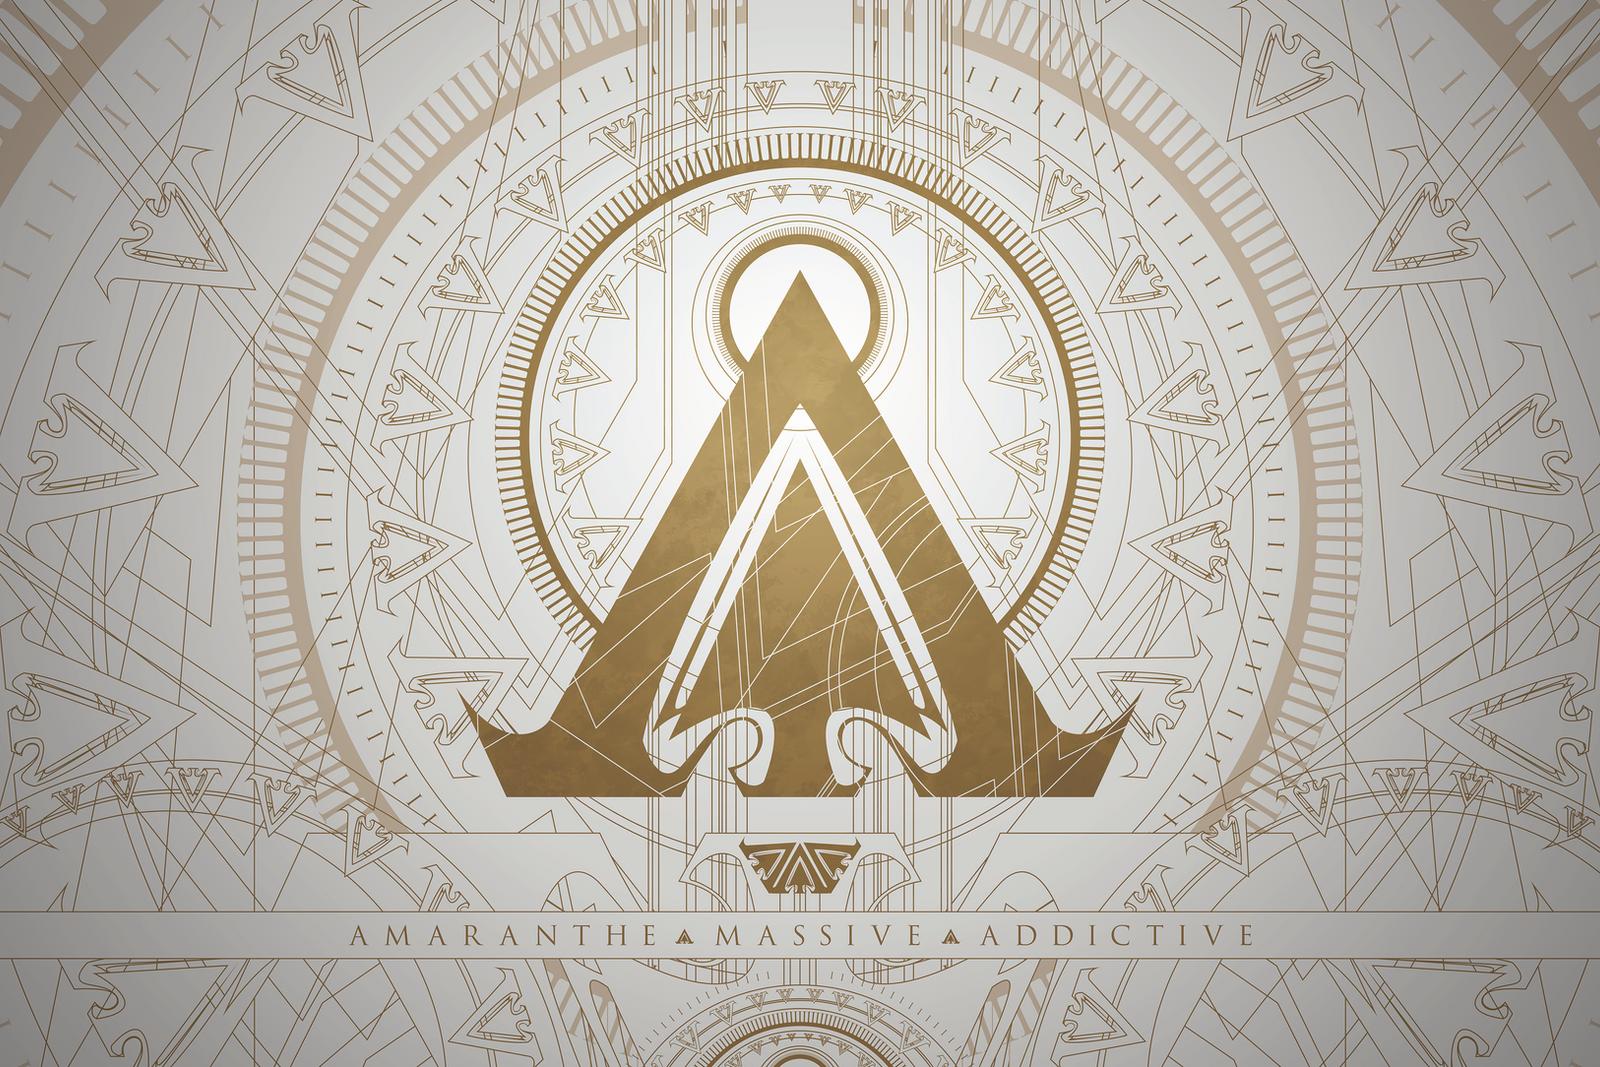 Amaranthe - Massive Addictive Poster by polygonbronson